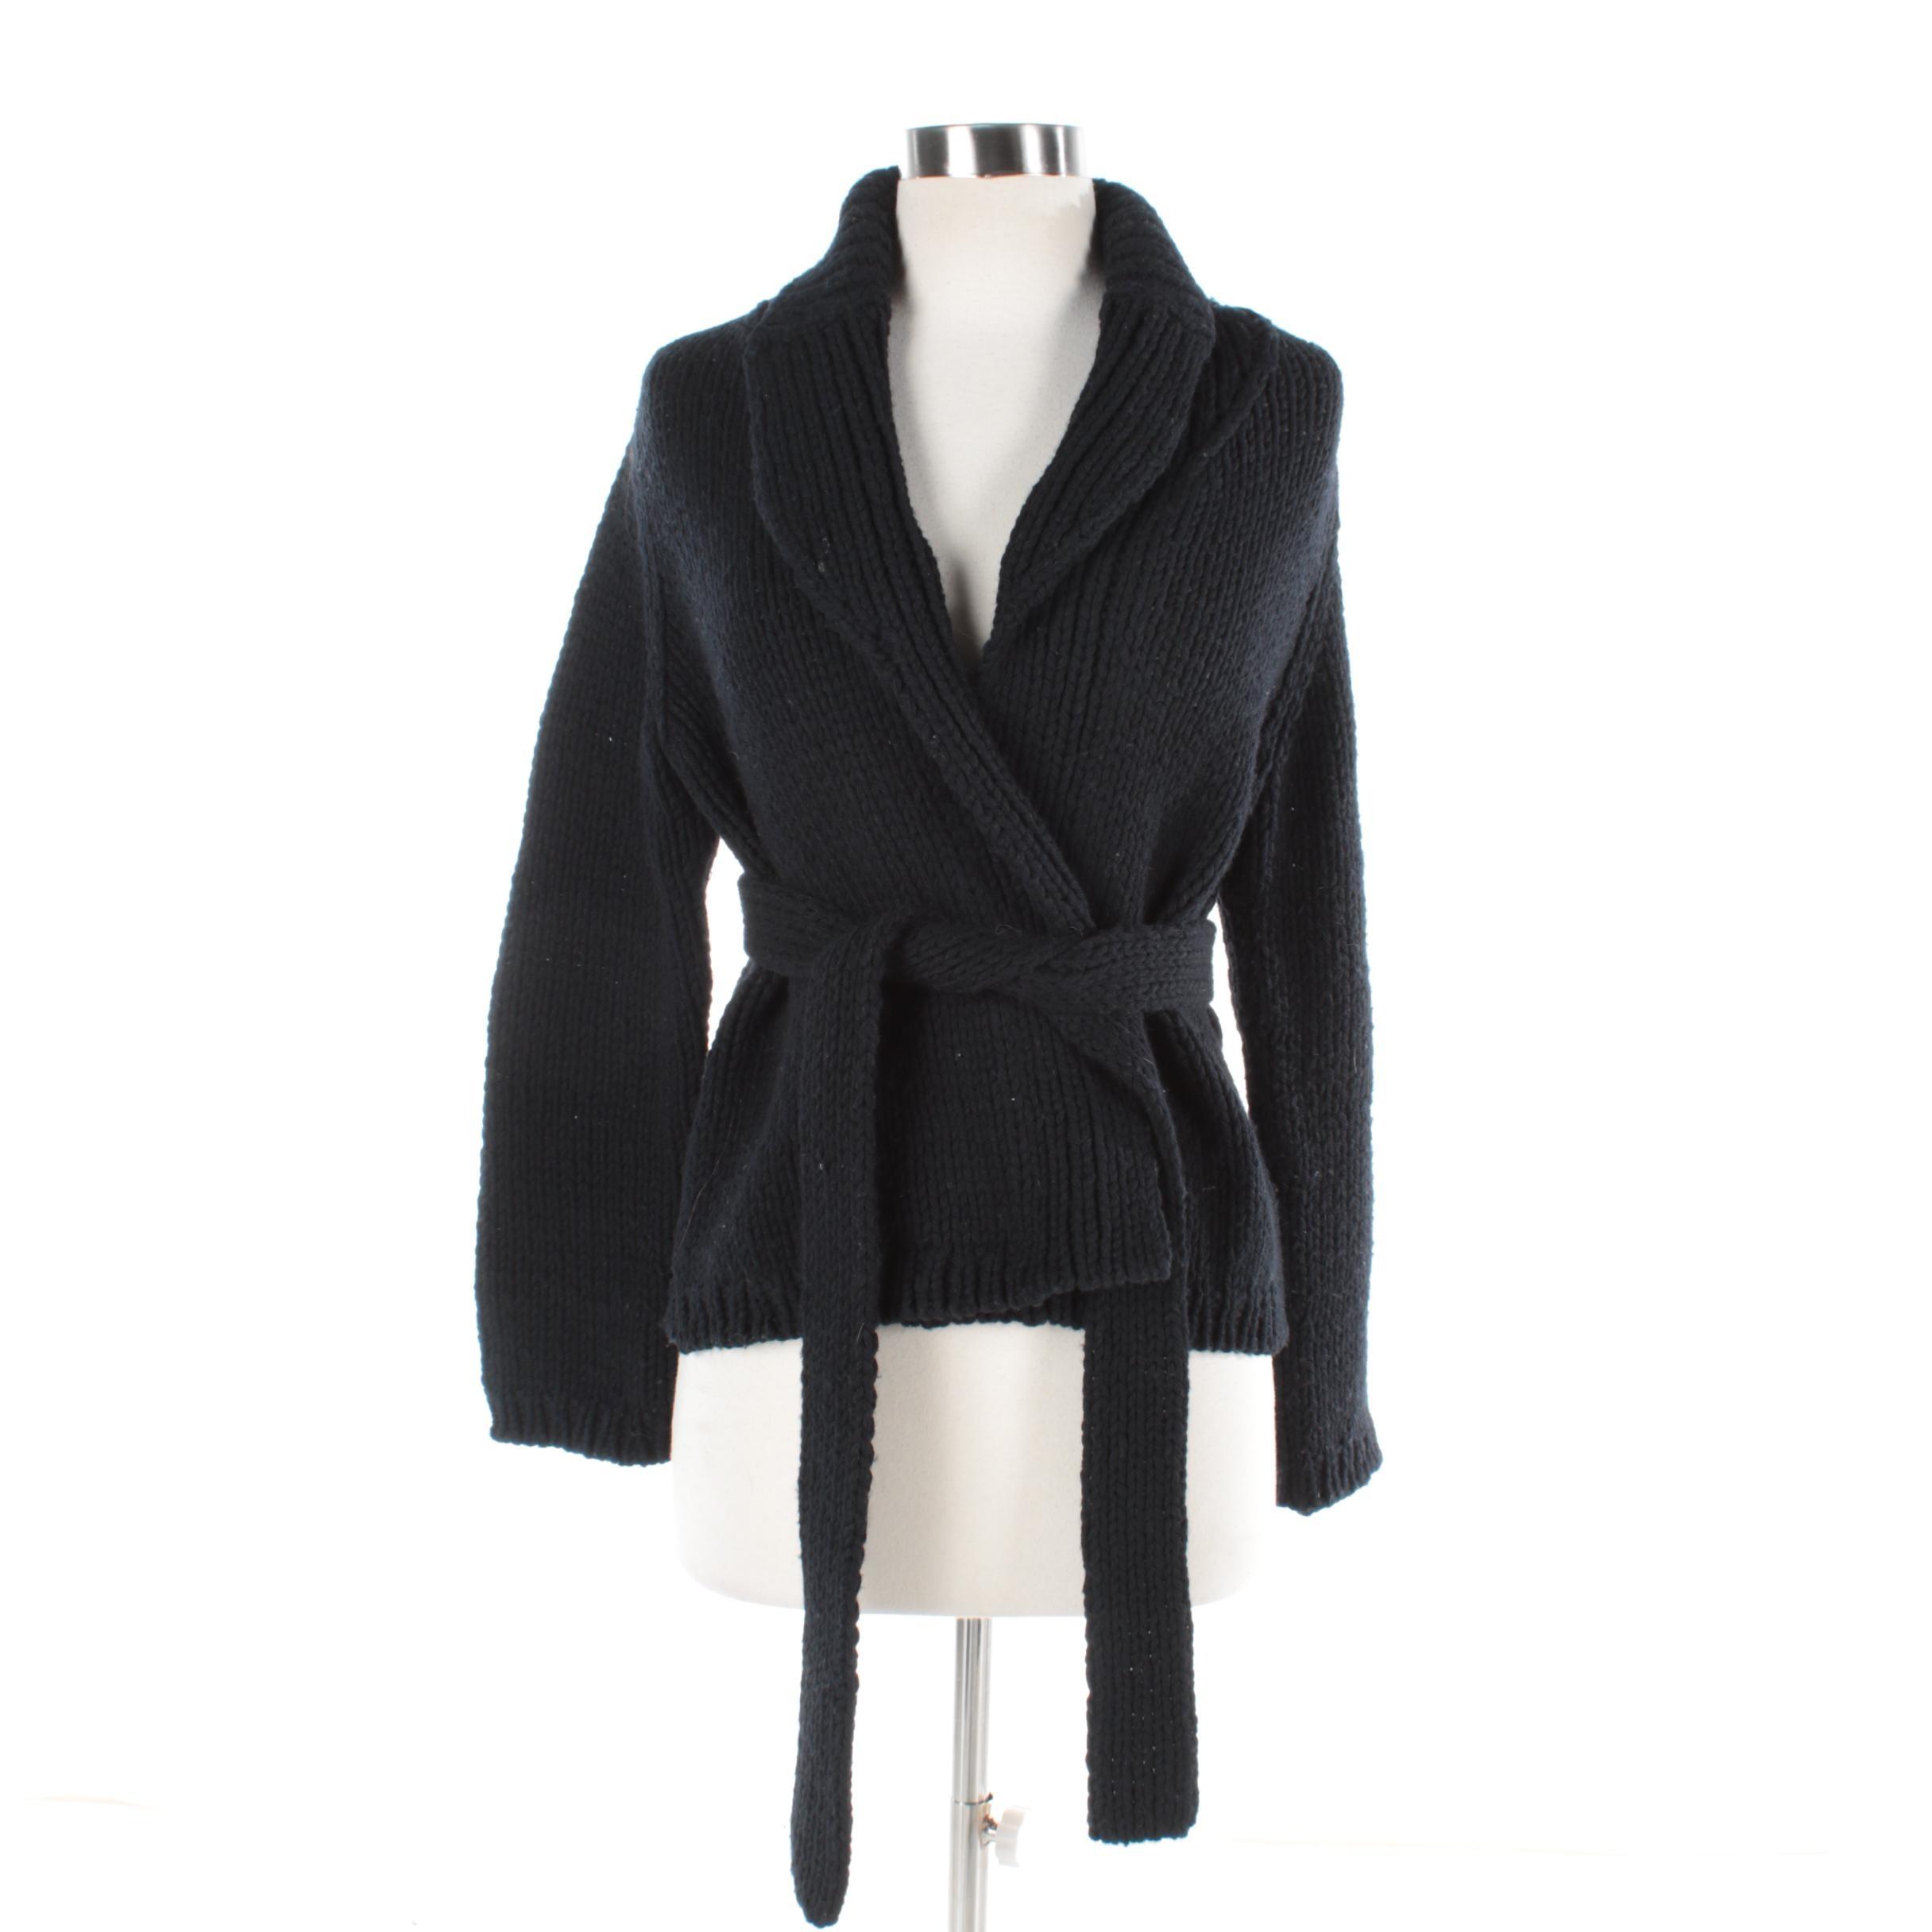 Women's Comme des Garçons Black Wool Blend Cardigan